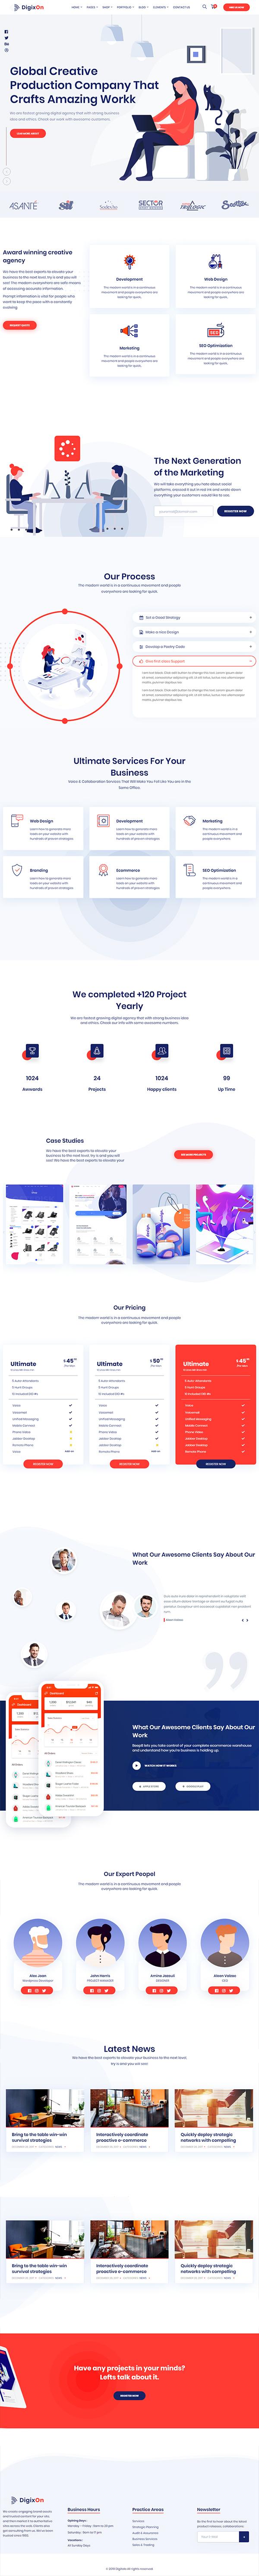 Digixon - Digital Marketing Strategy Consulting WP Theme